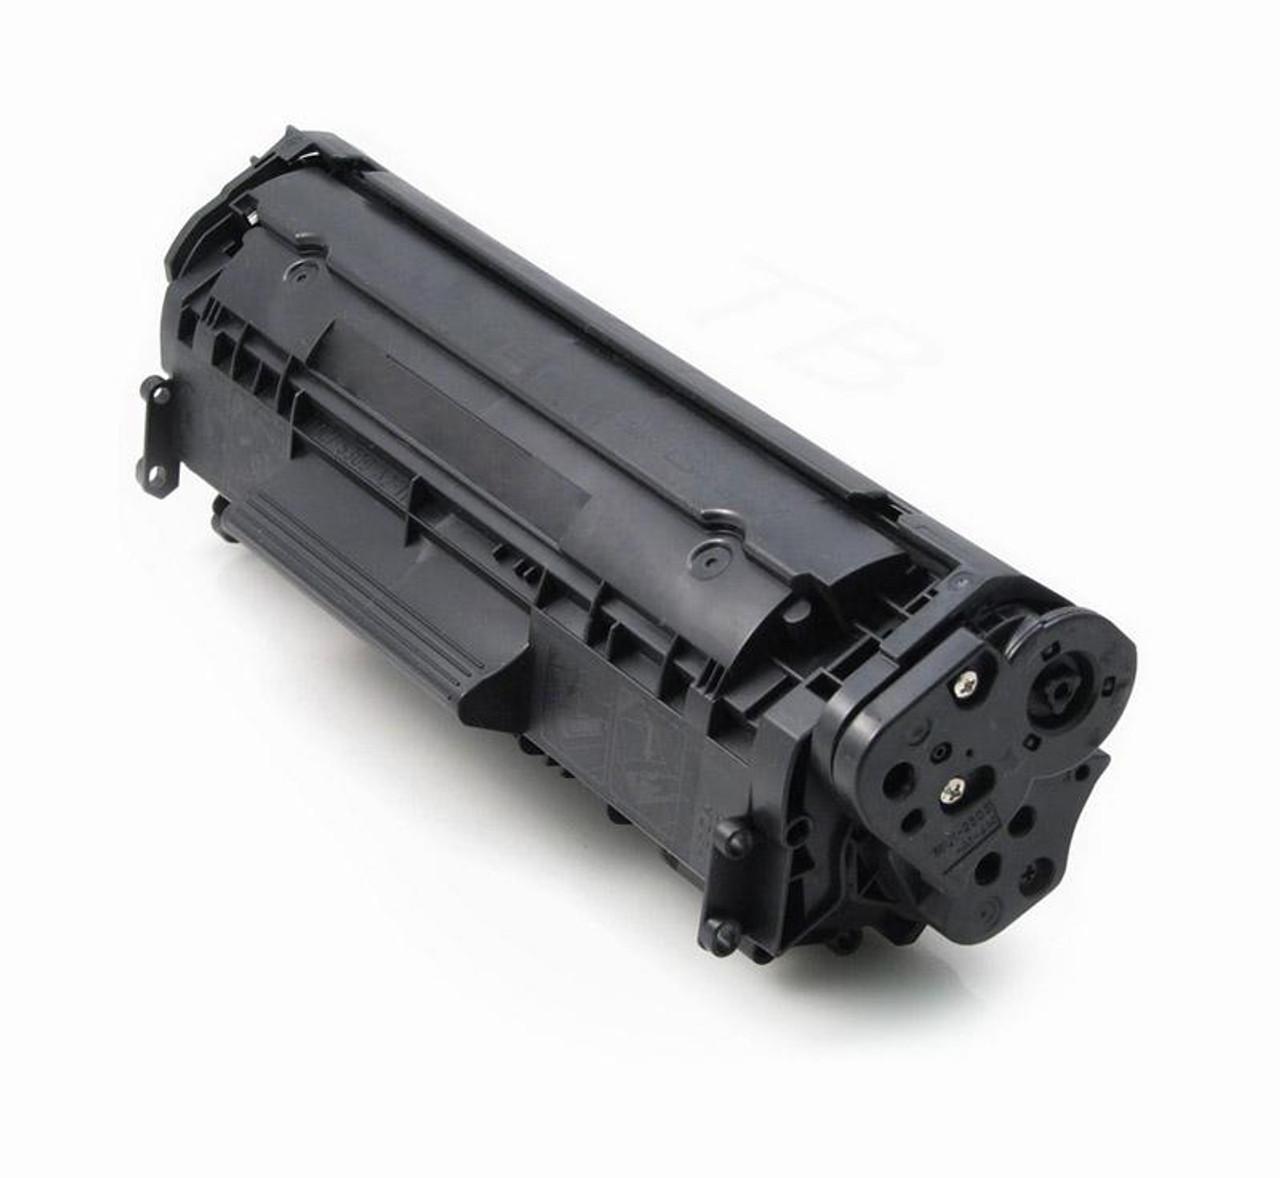 HP 1022 3030 Toner Cartridge - New compatible